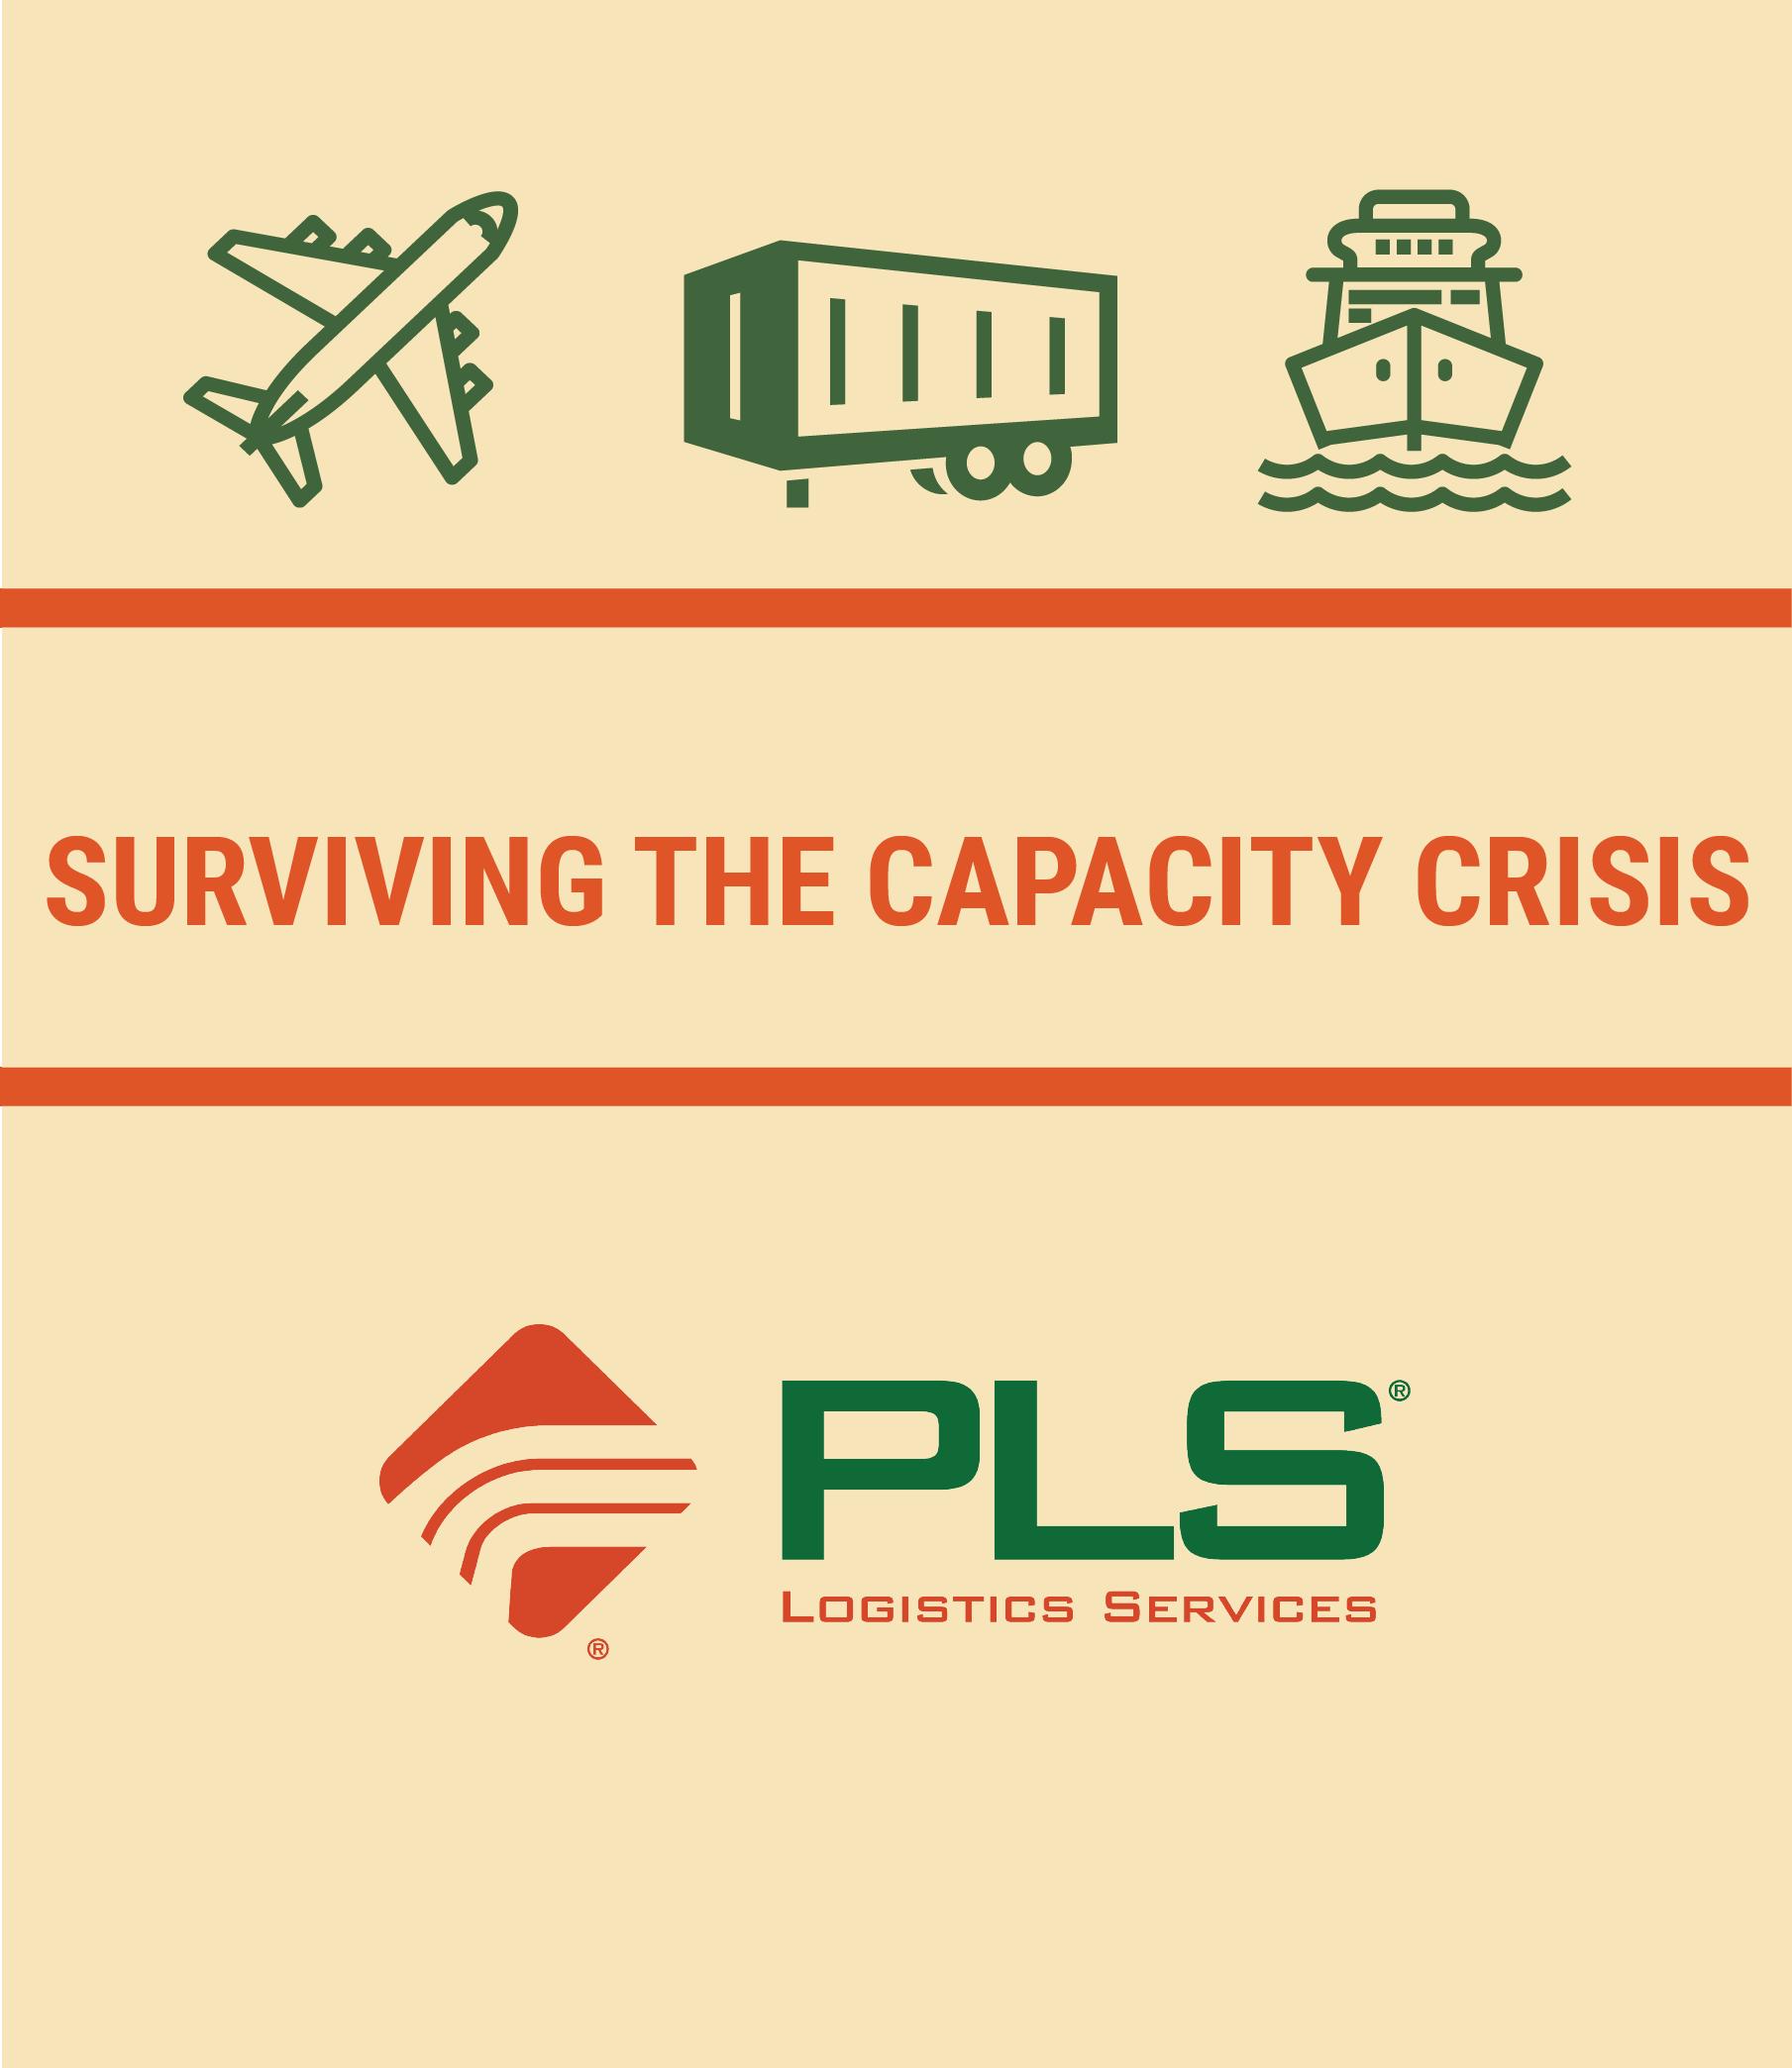 Surviving The Capacity Crisis